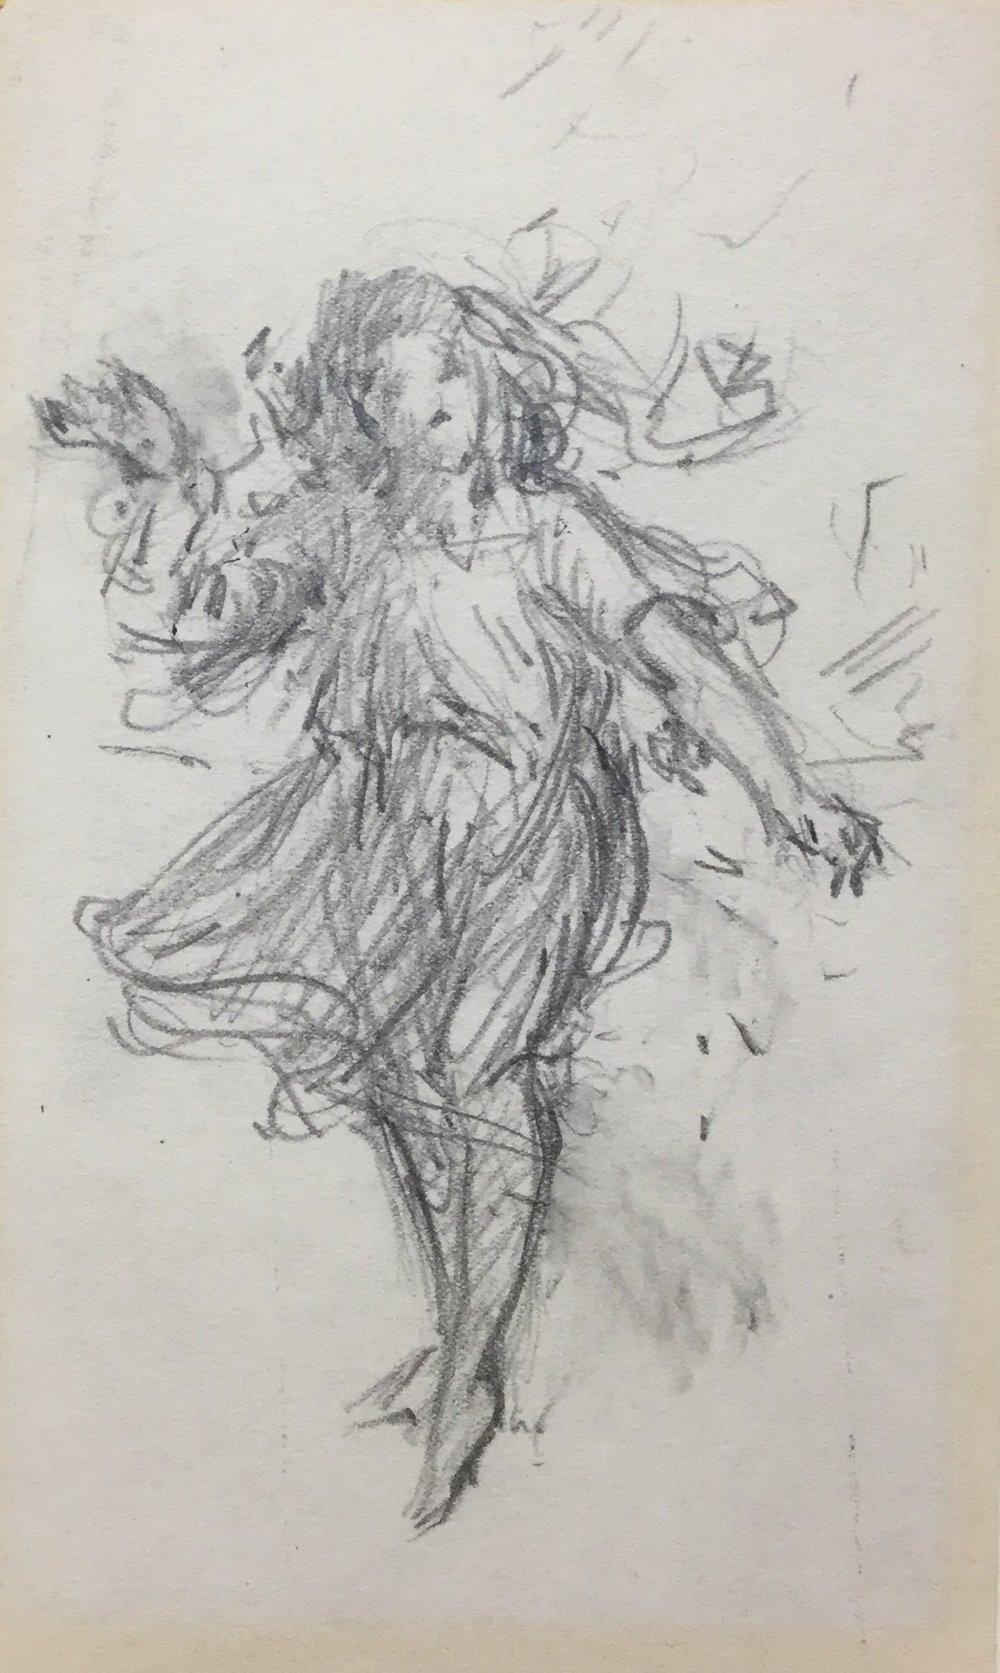 Sketch of Marjorie Daingerfield